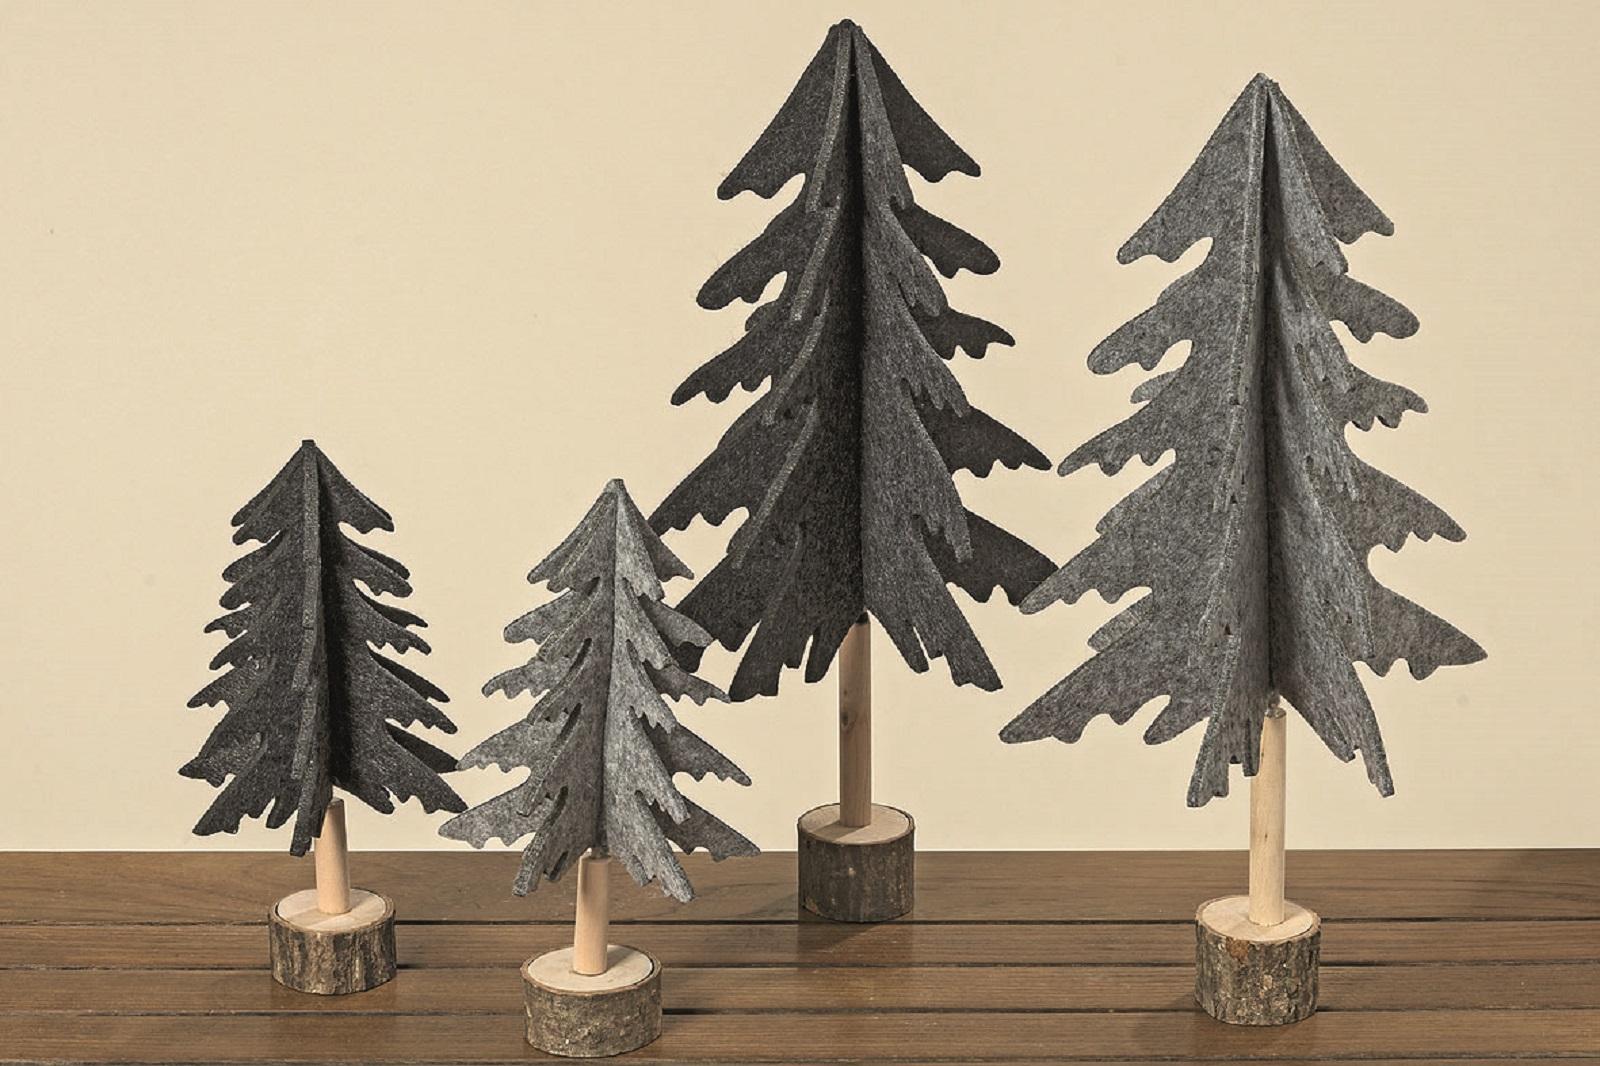 Baum Filz Dekobaum H 26 cm Stückpreis